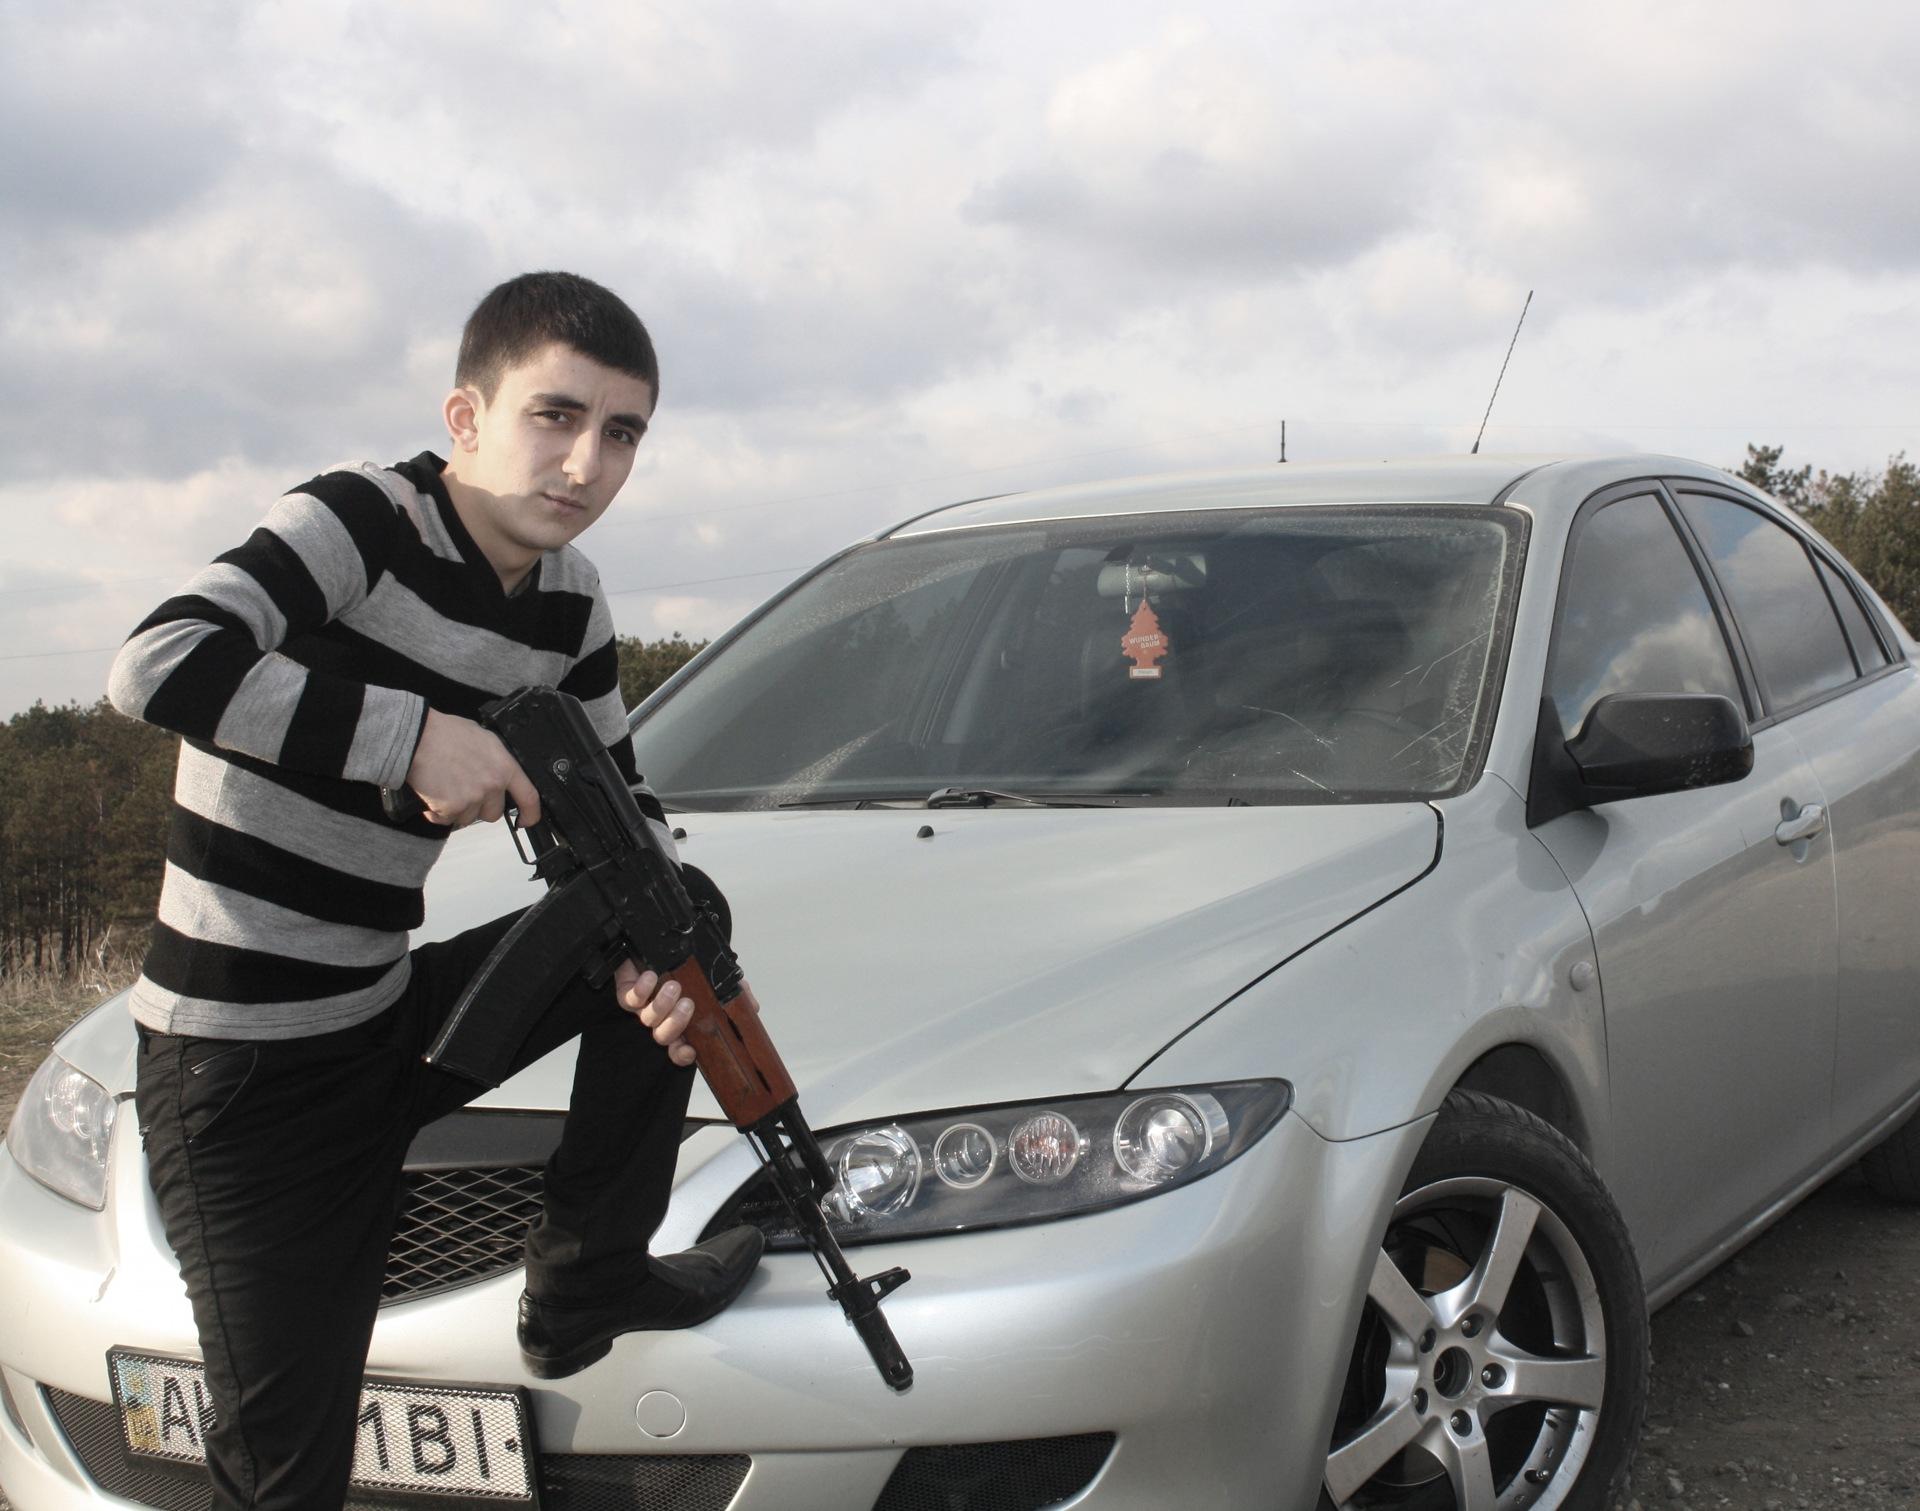 Фото на аву машины ак-47